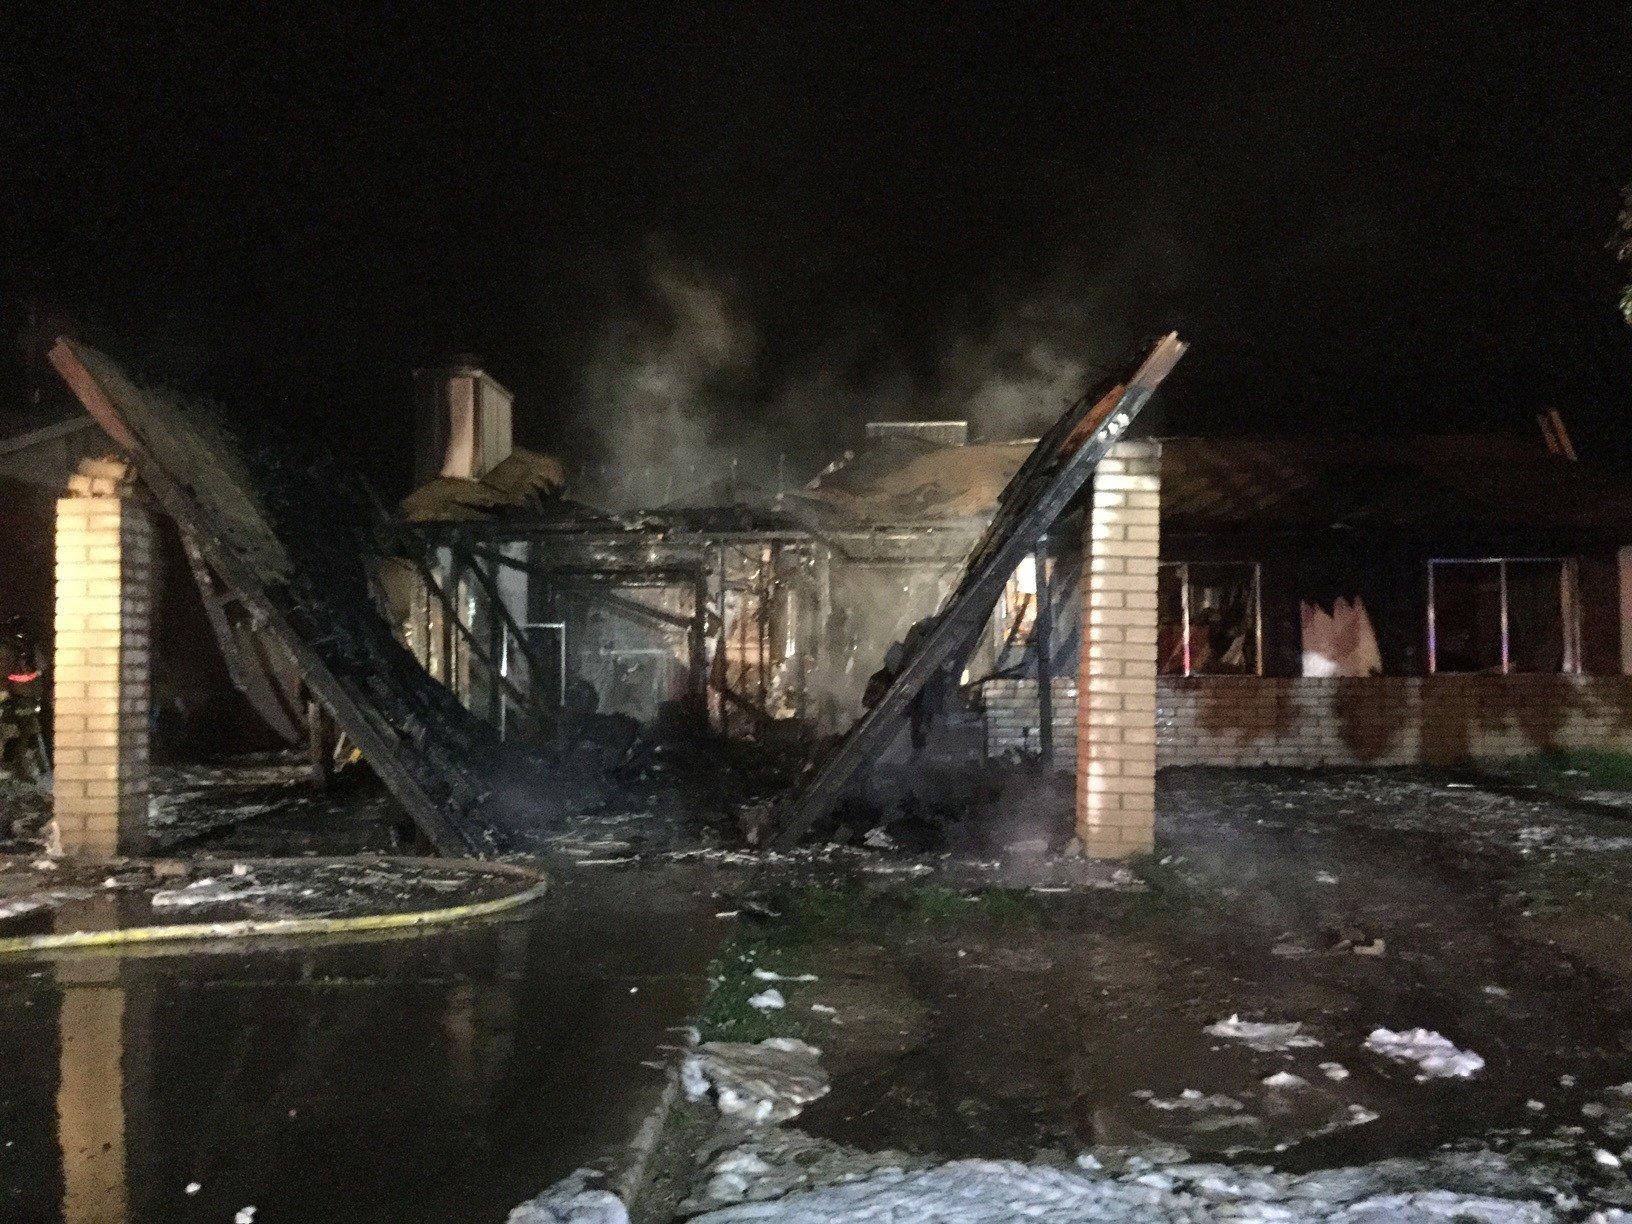 An early-morning fire guts a home in Phoenix. (Source: Phoenix Fire Department)